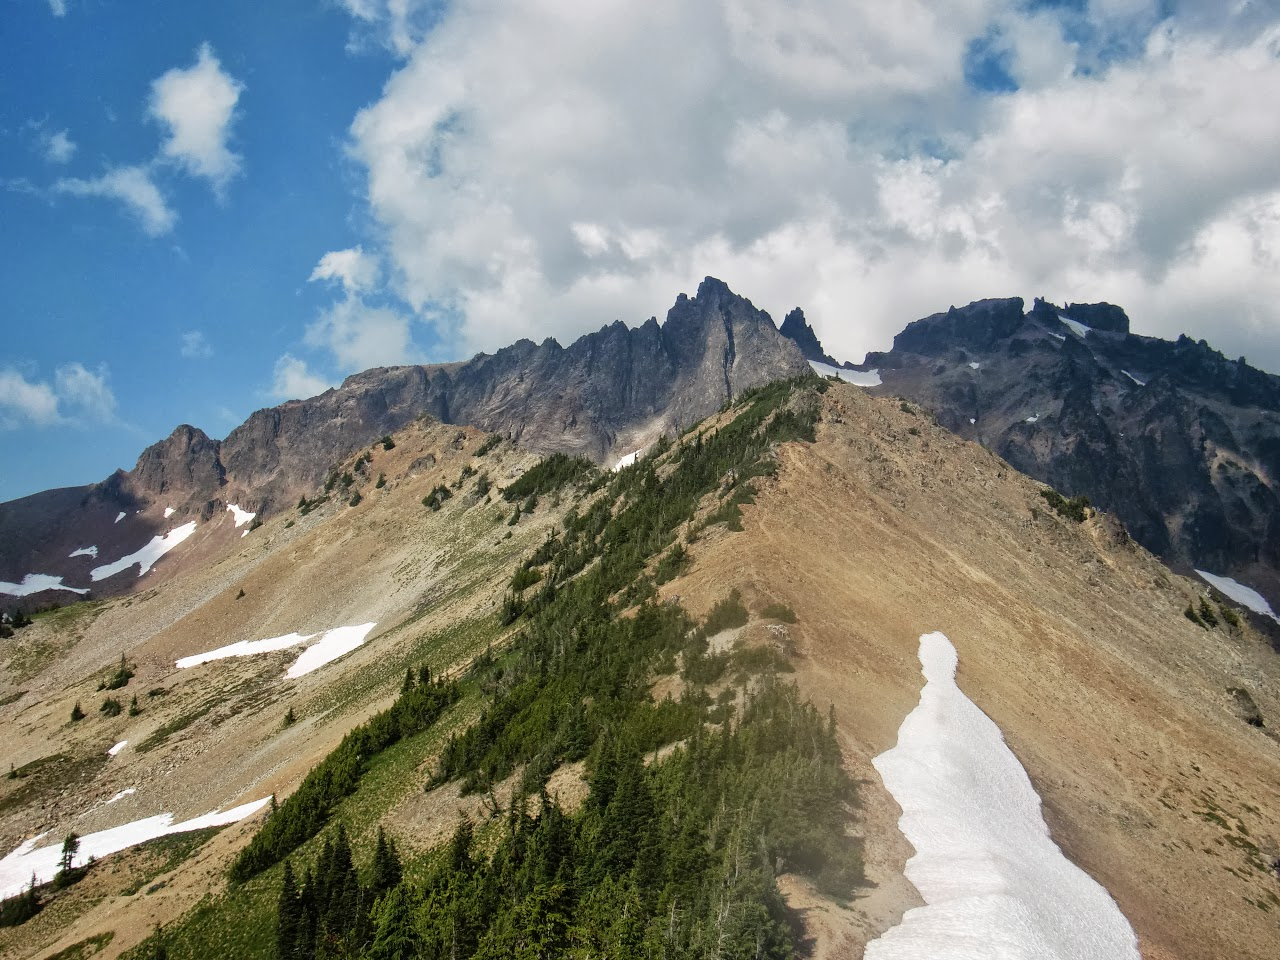 At the top of Cispus Pass